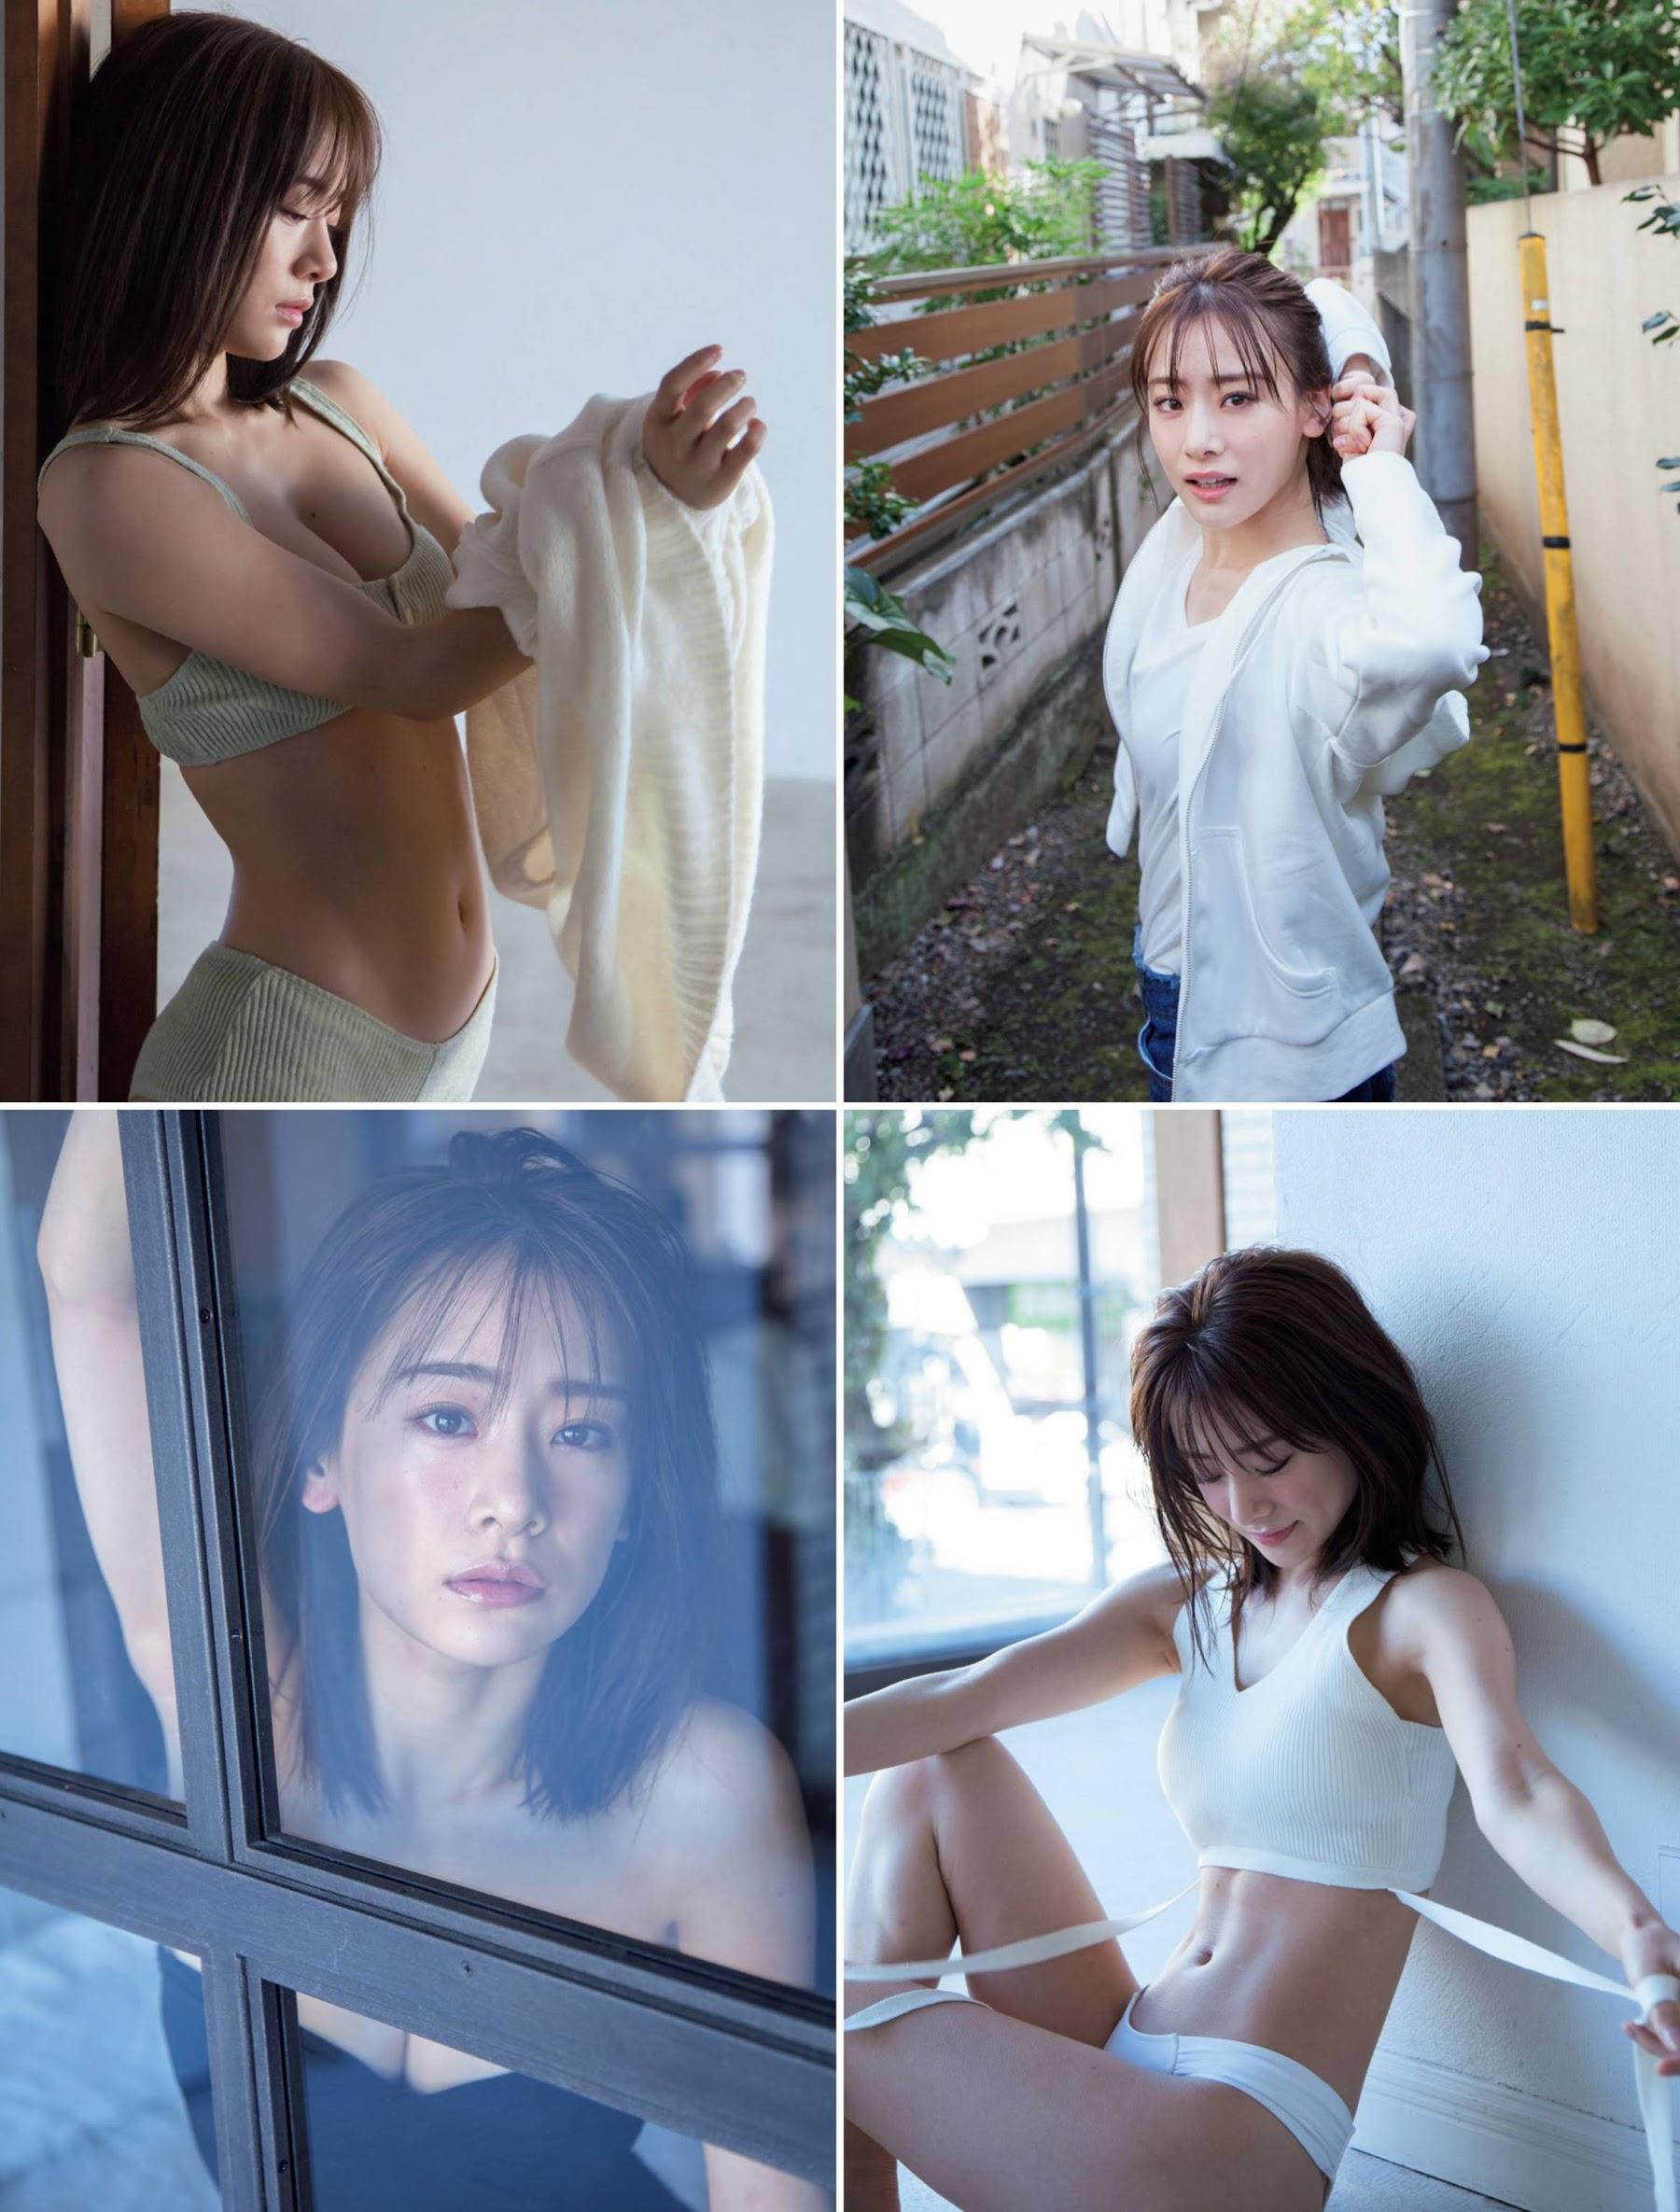 Newcomer in the gravure world who graduated from Tokyo University of Science Minami Fukuoka Swimsuit gravure bikini beauty BODY Rikejo 2020002